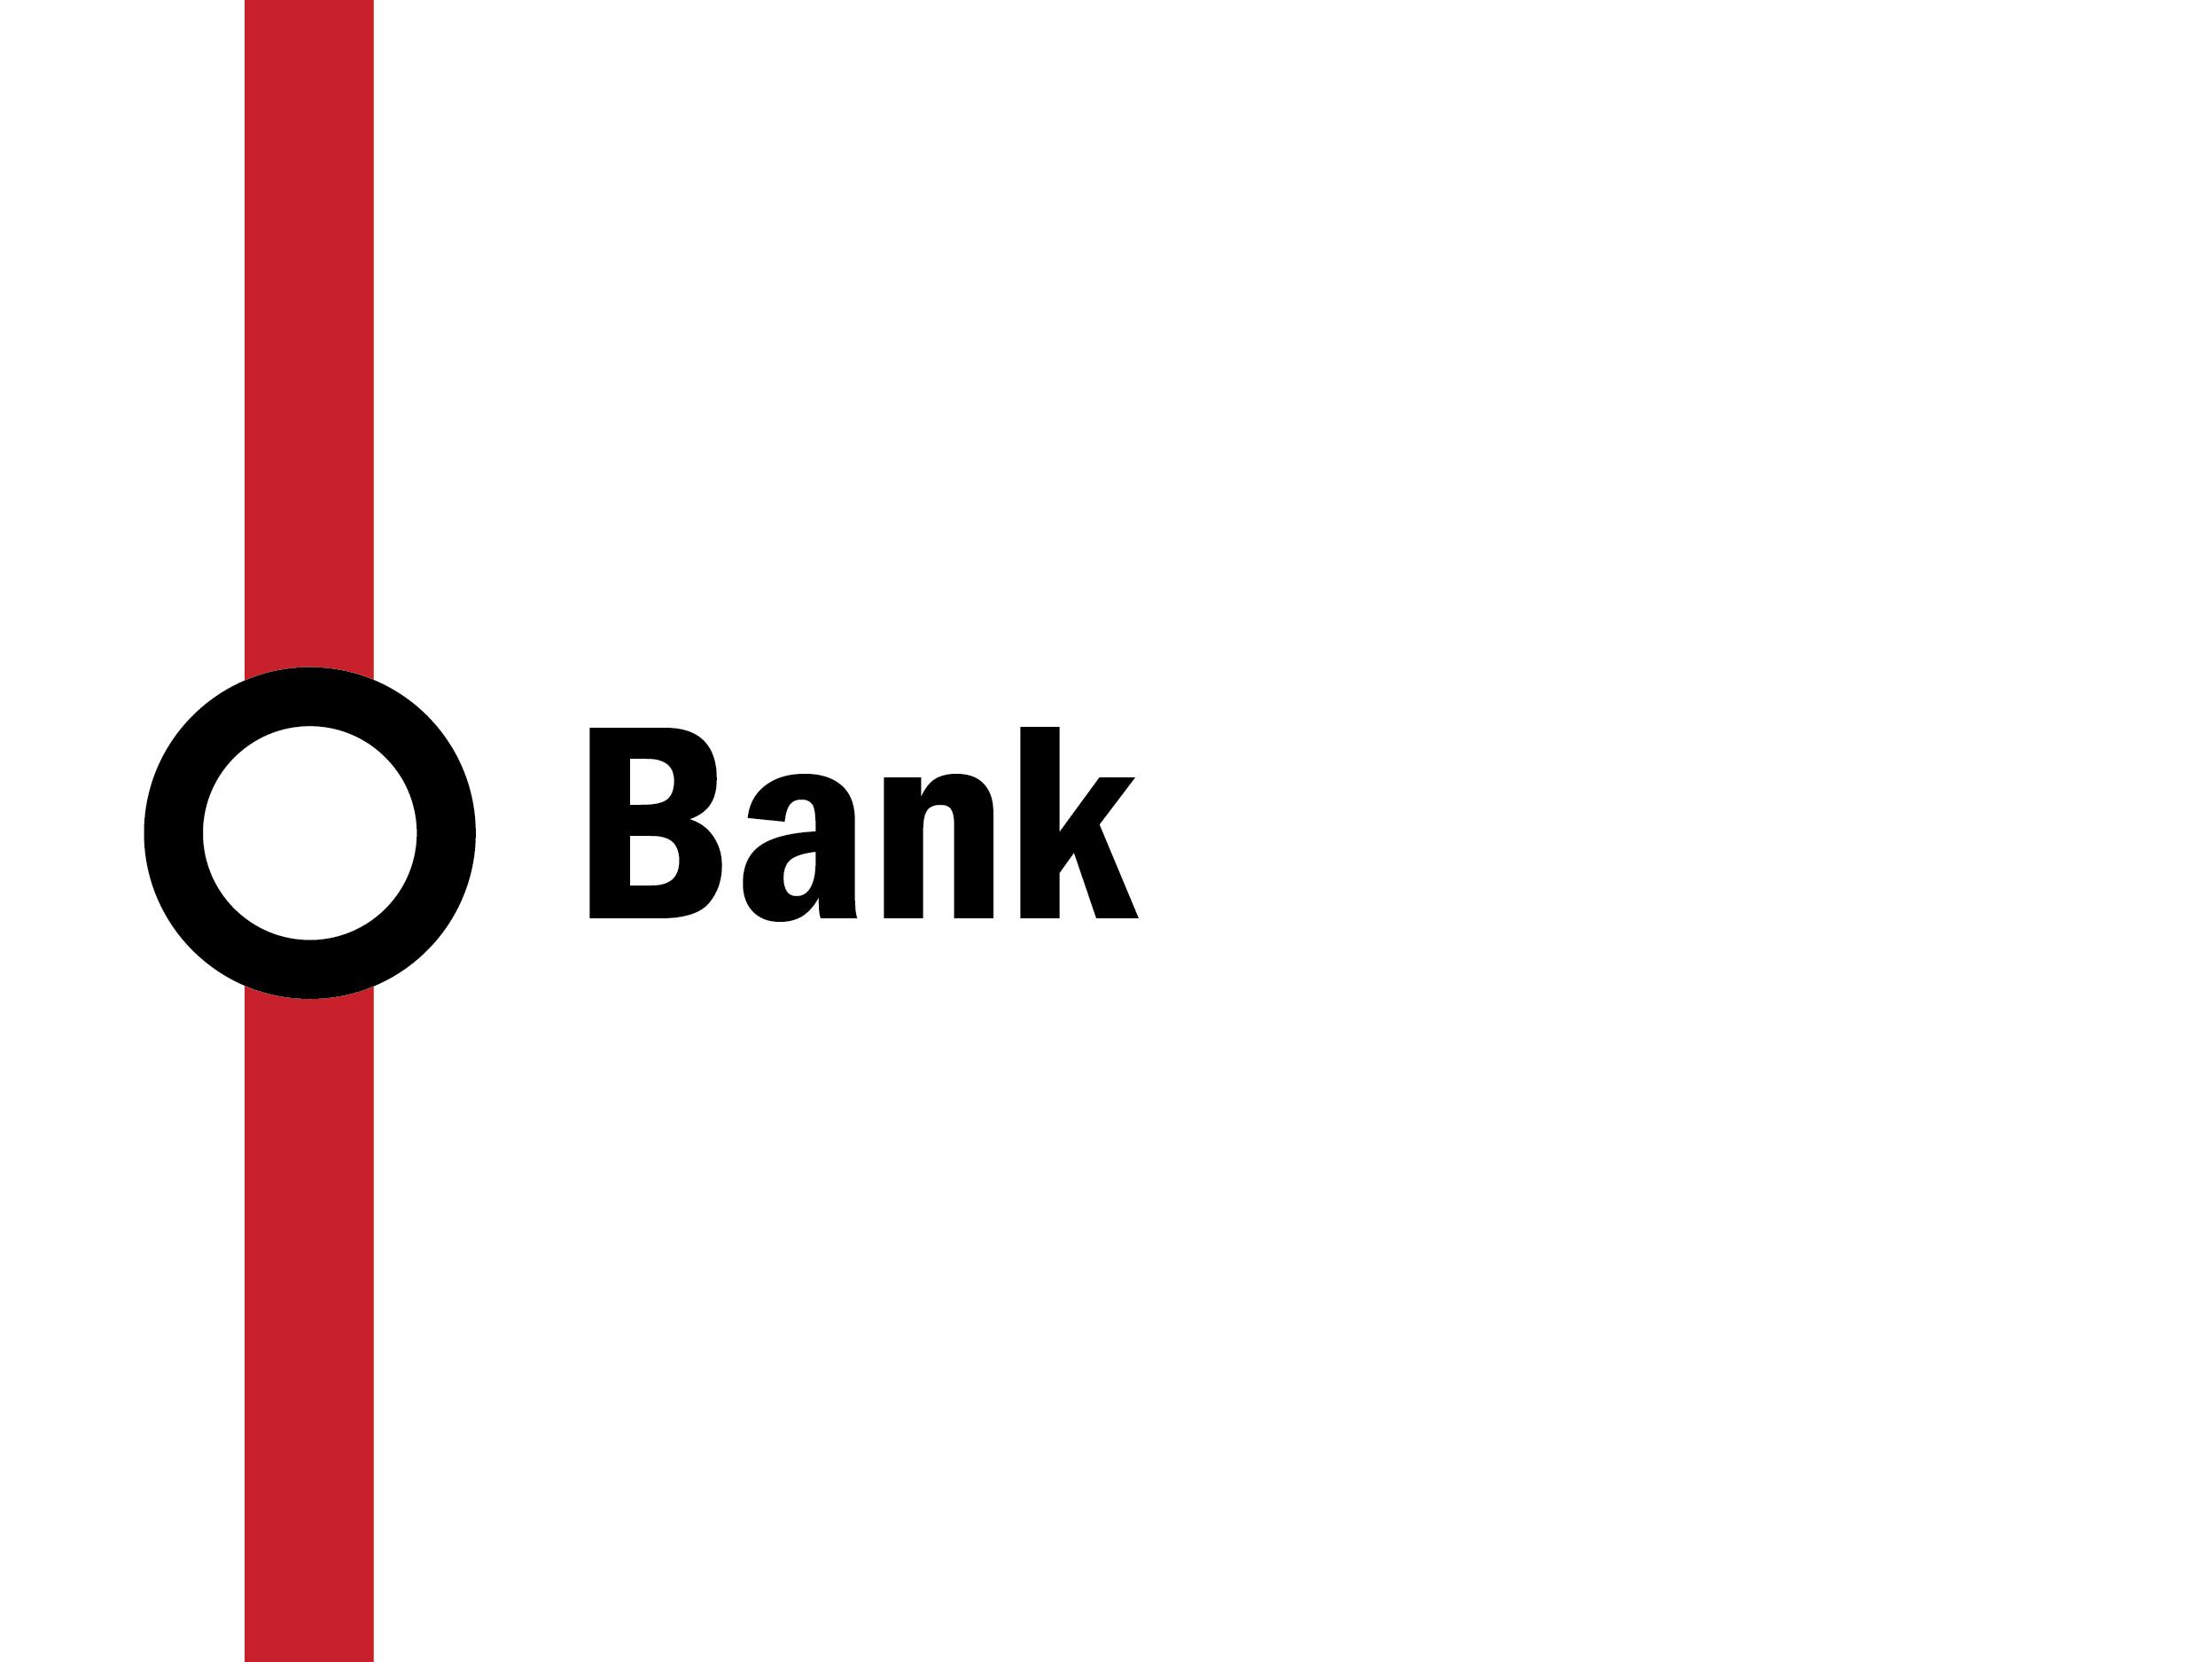 Night tube: Bank